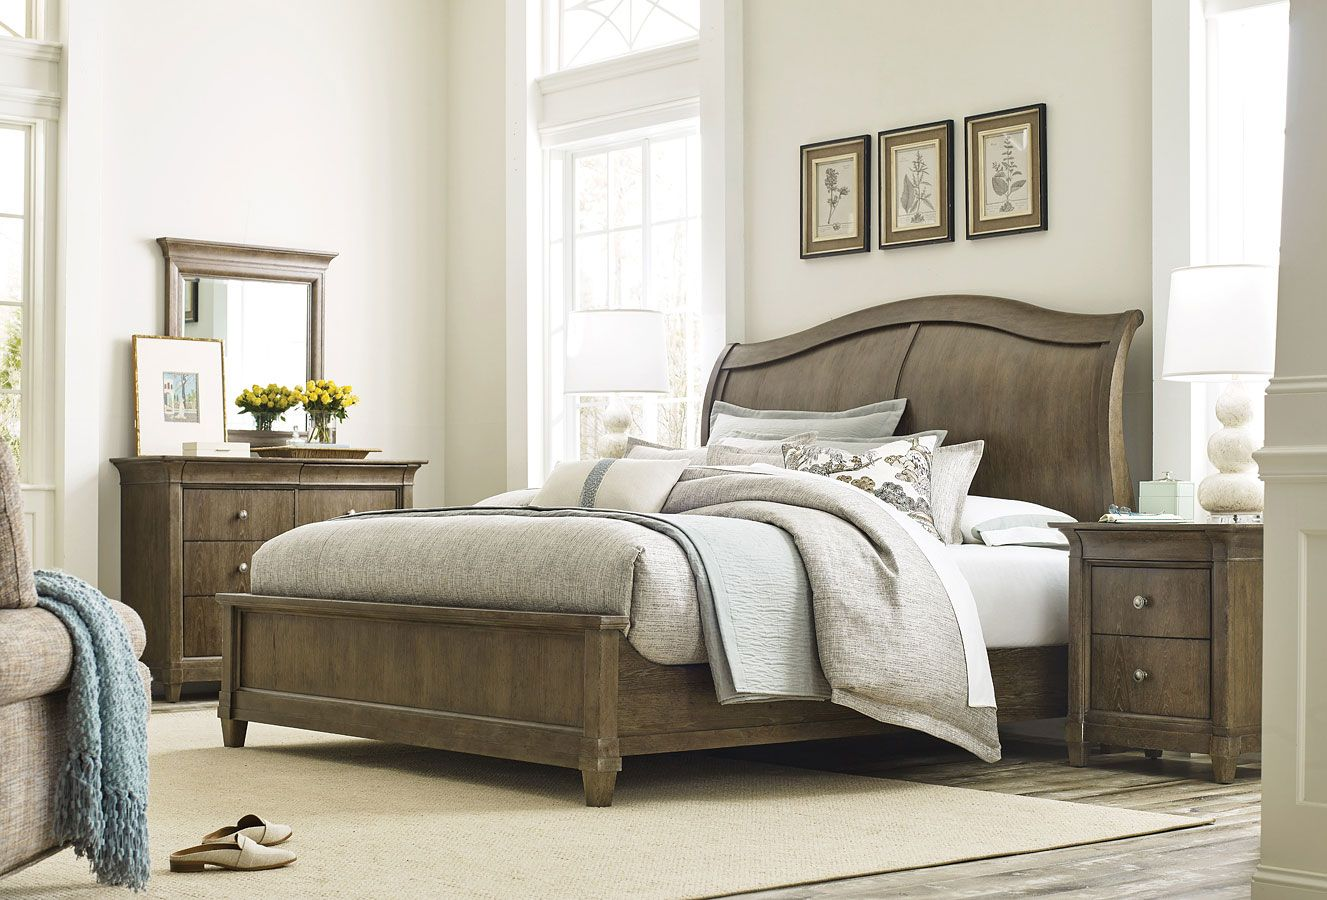 Anson Ashford Sleigh Bedroom Set Sleigh bedroom set